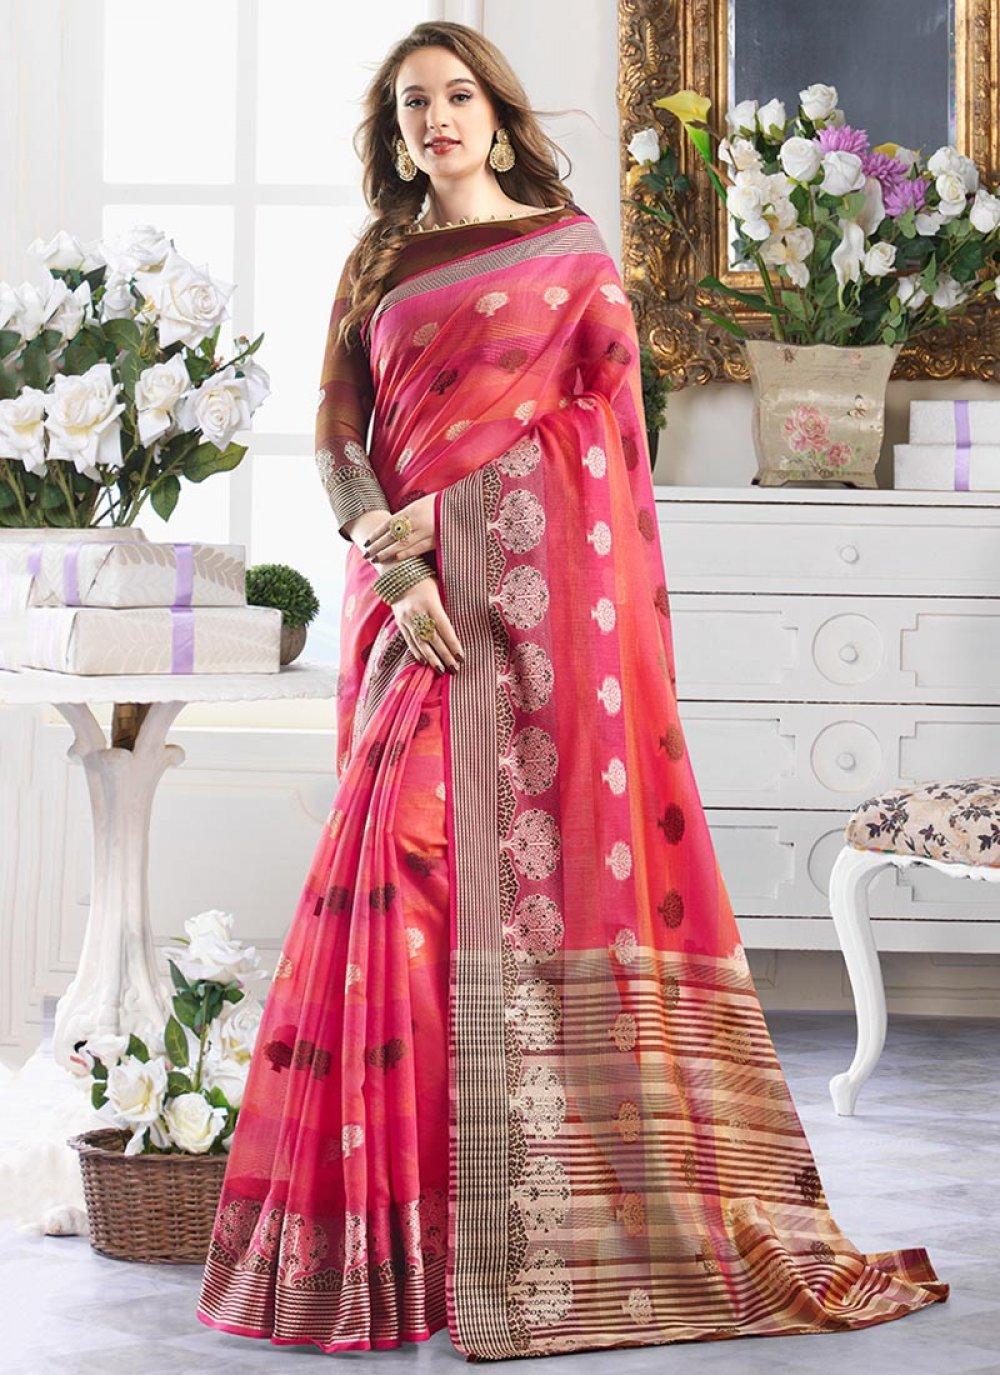 Print Handloom Cotton Shaded Saree in Multi Colour